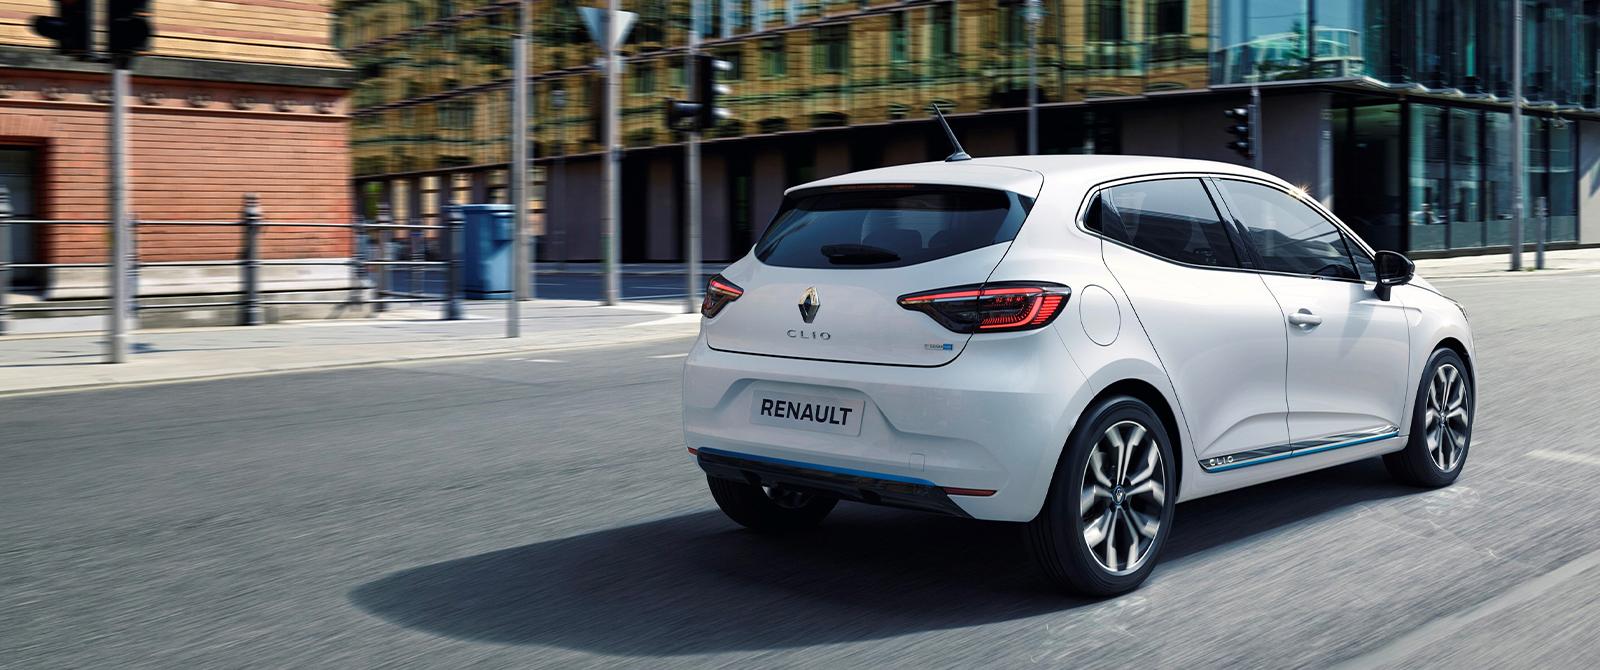 offre Renault Fleet Customer solutions